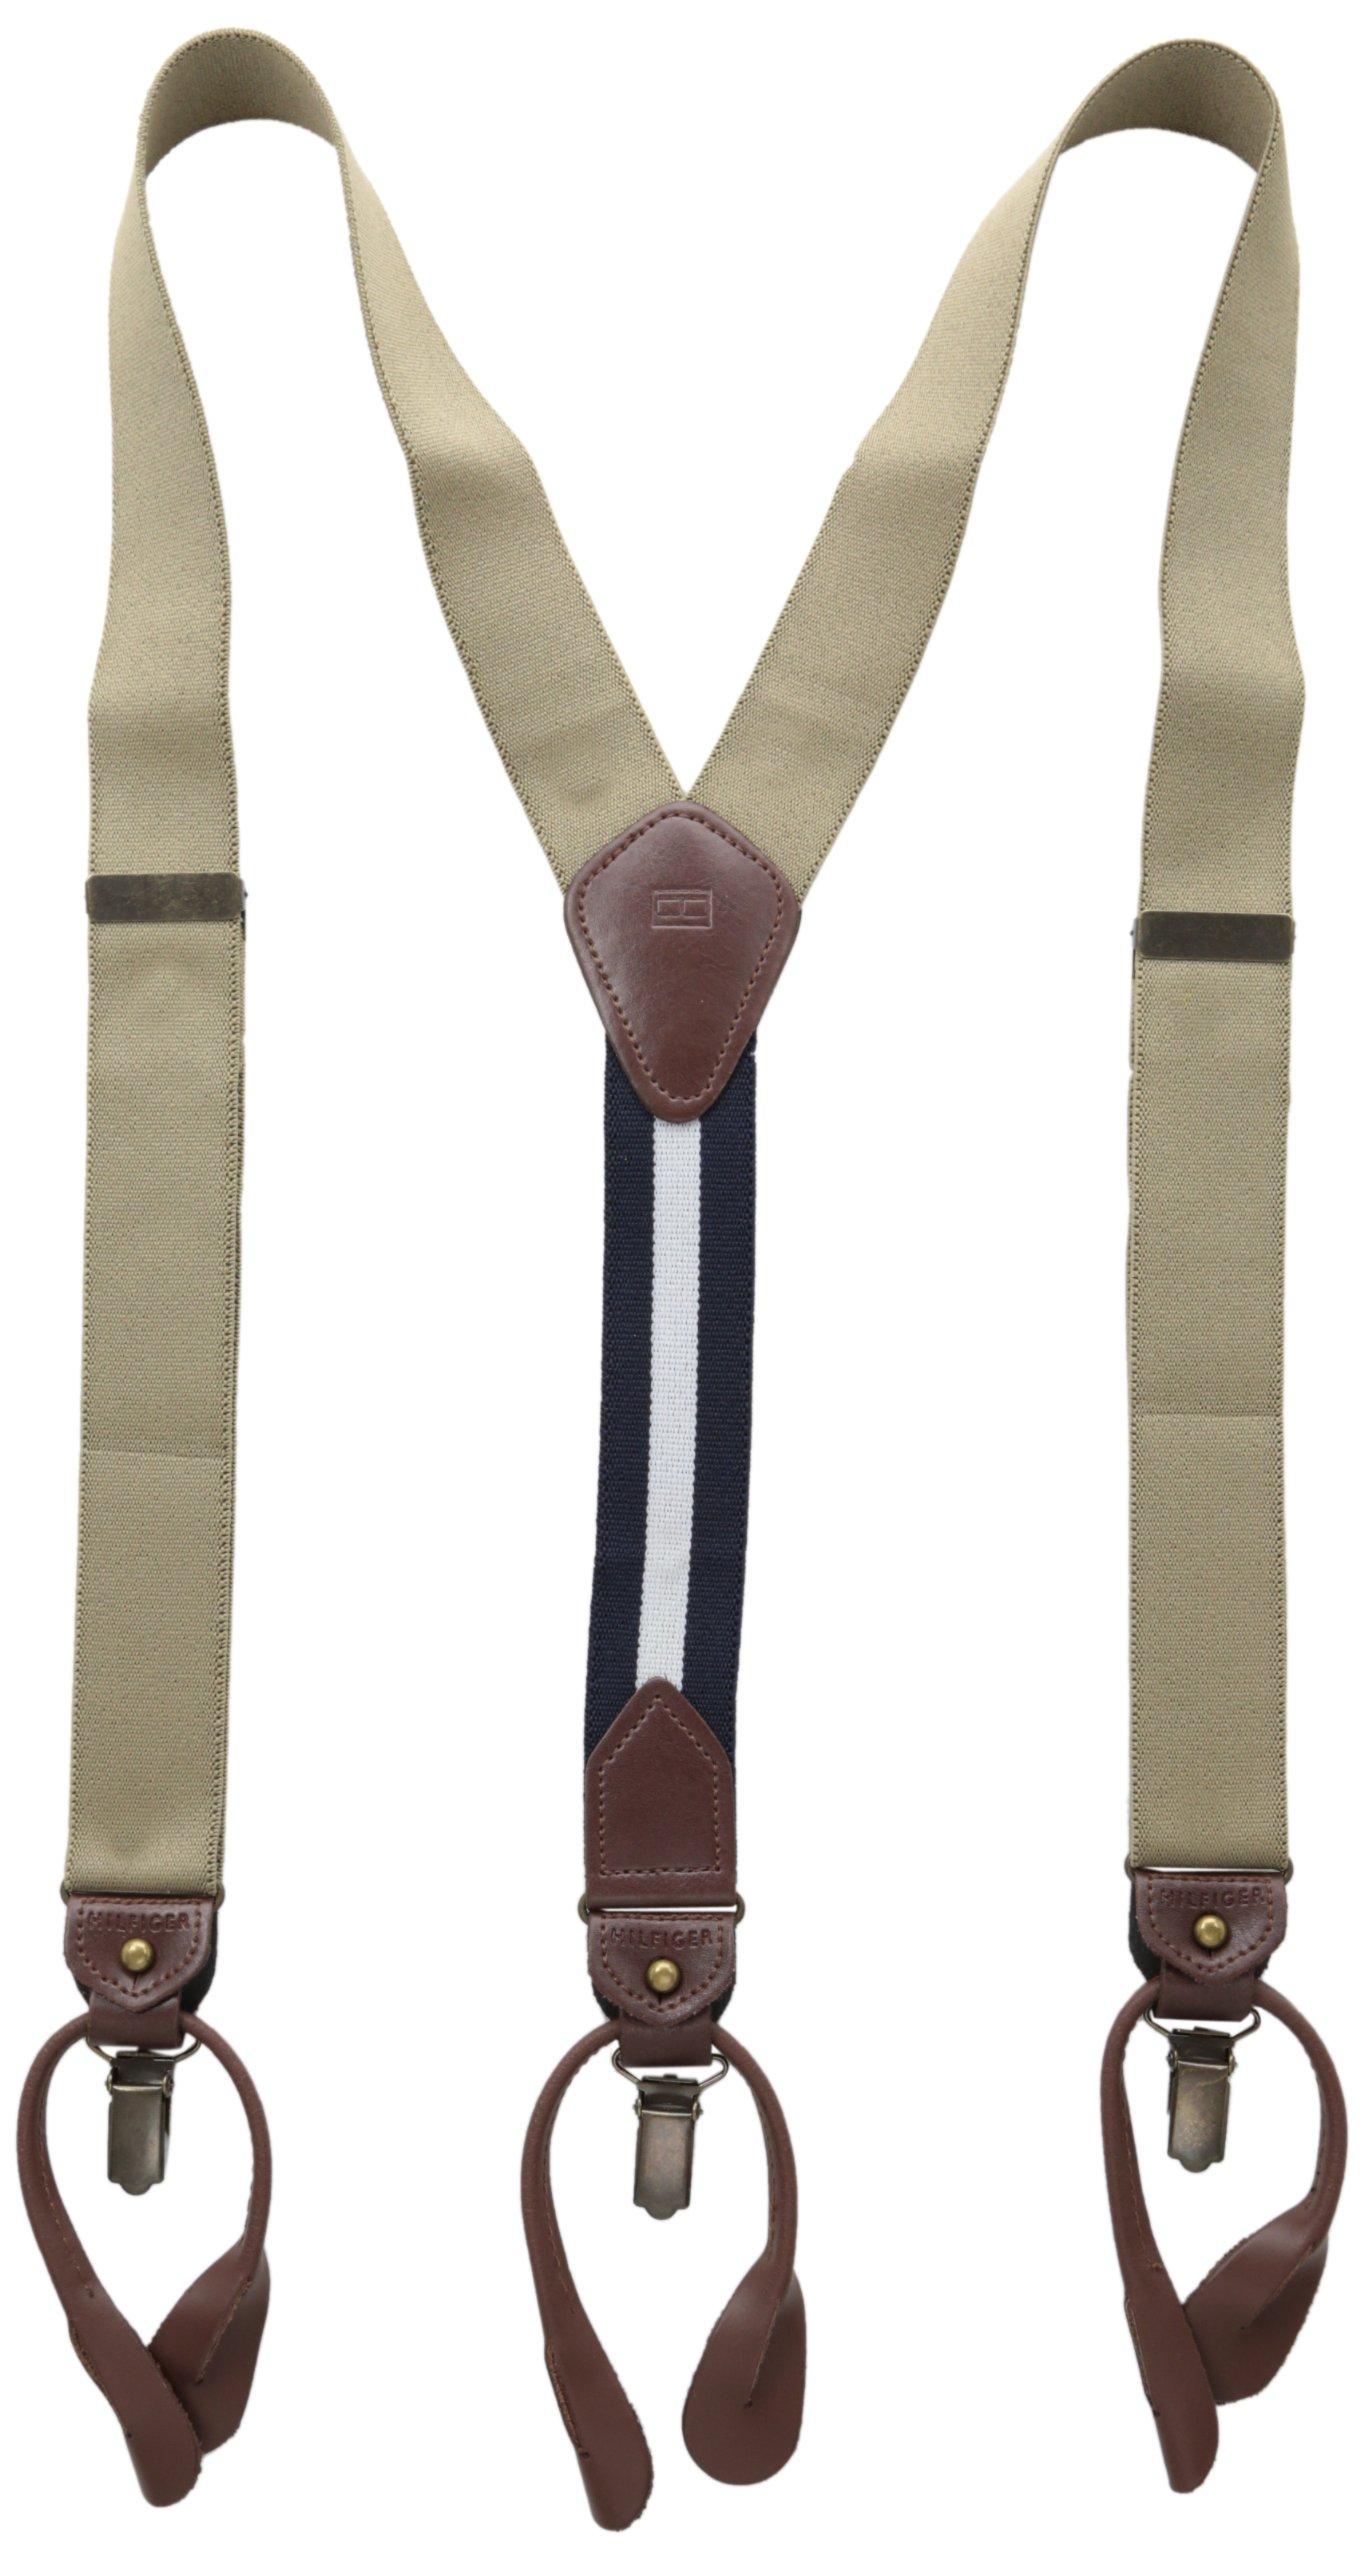 Tommy Hilfiger Men's 32mm Suspenders,Khaki,One Size